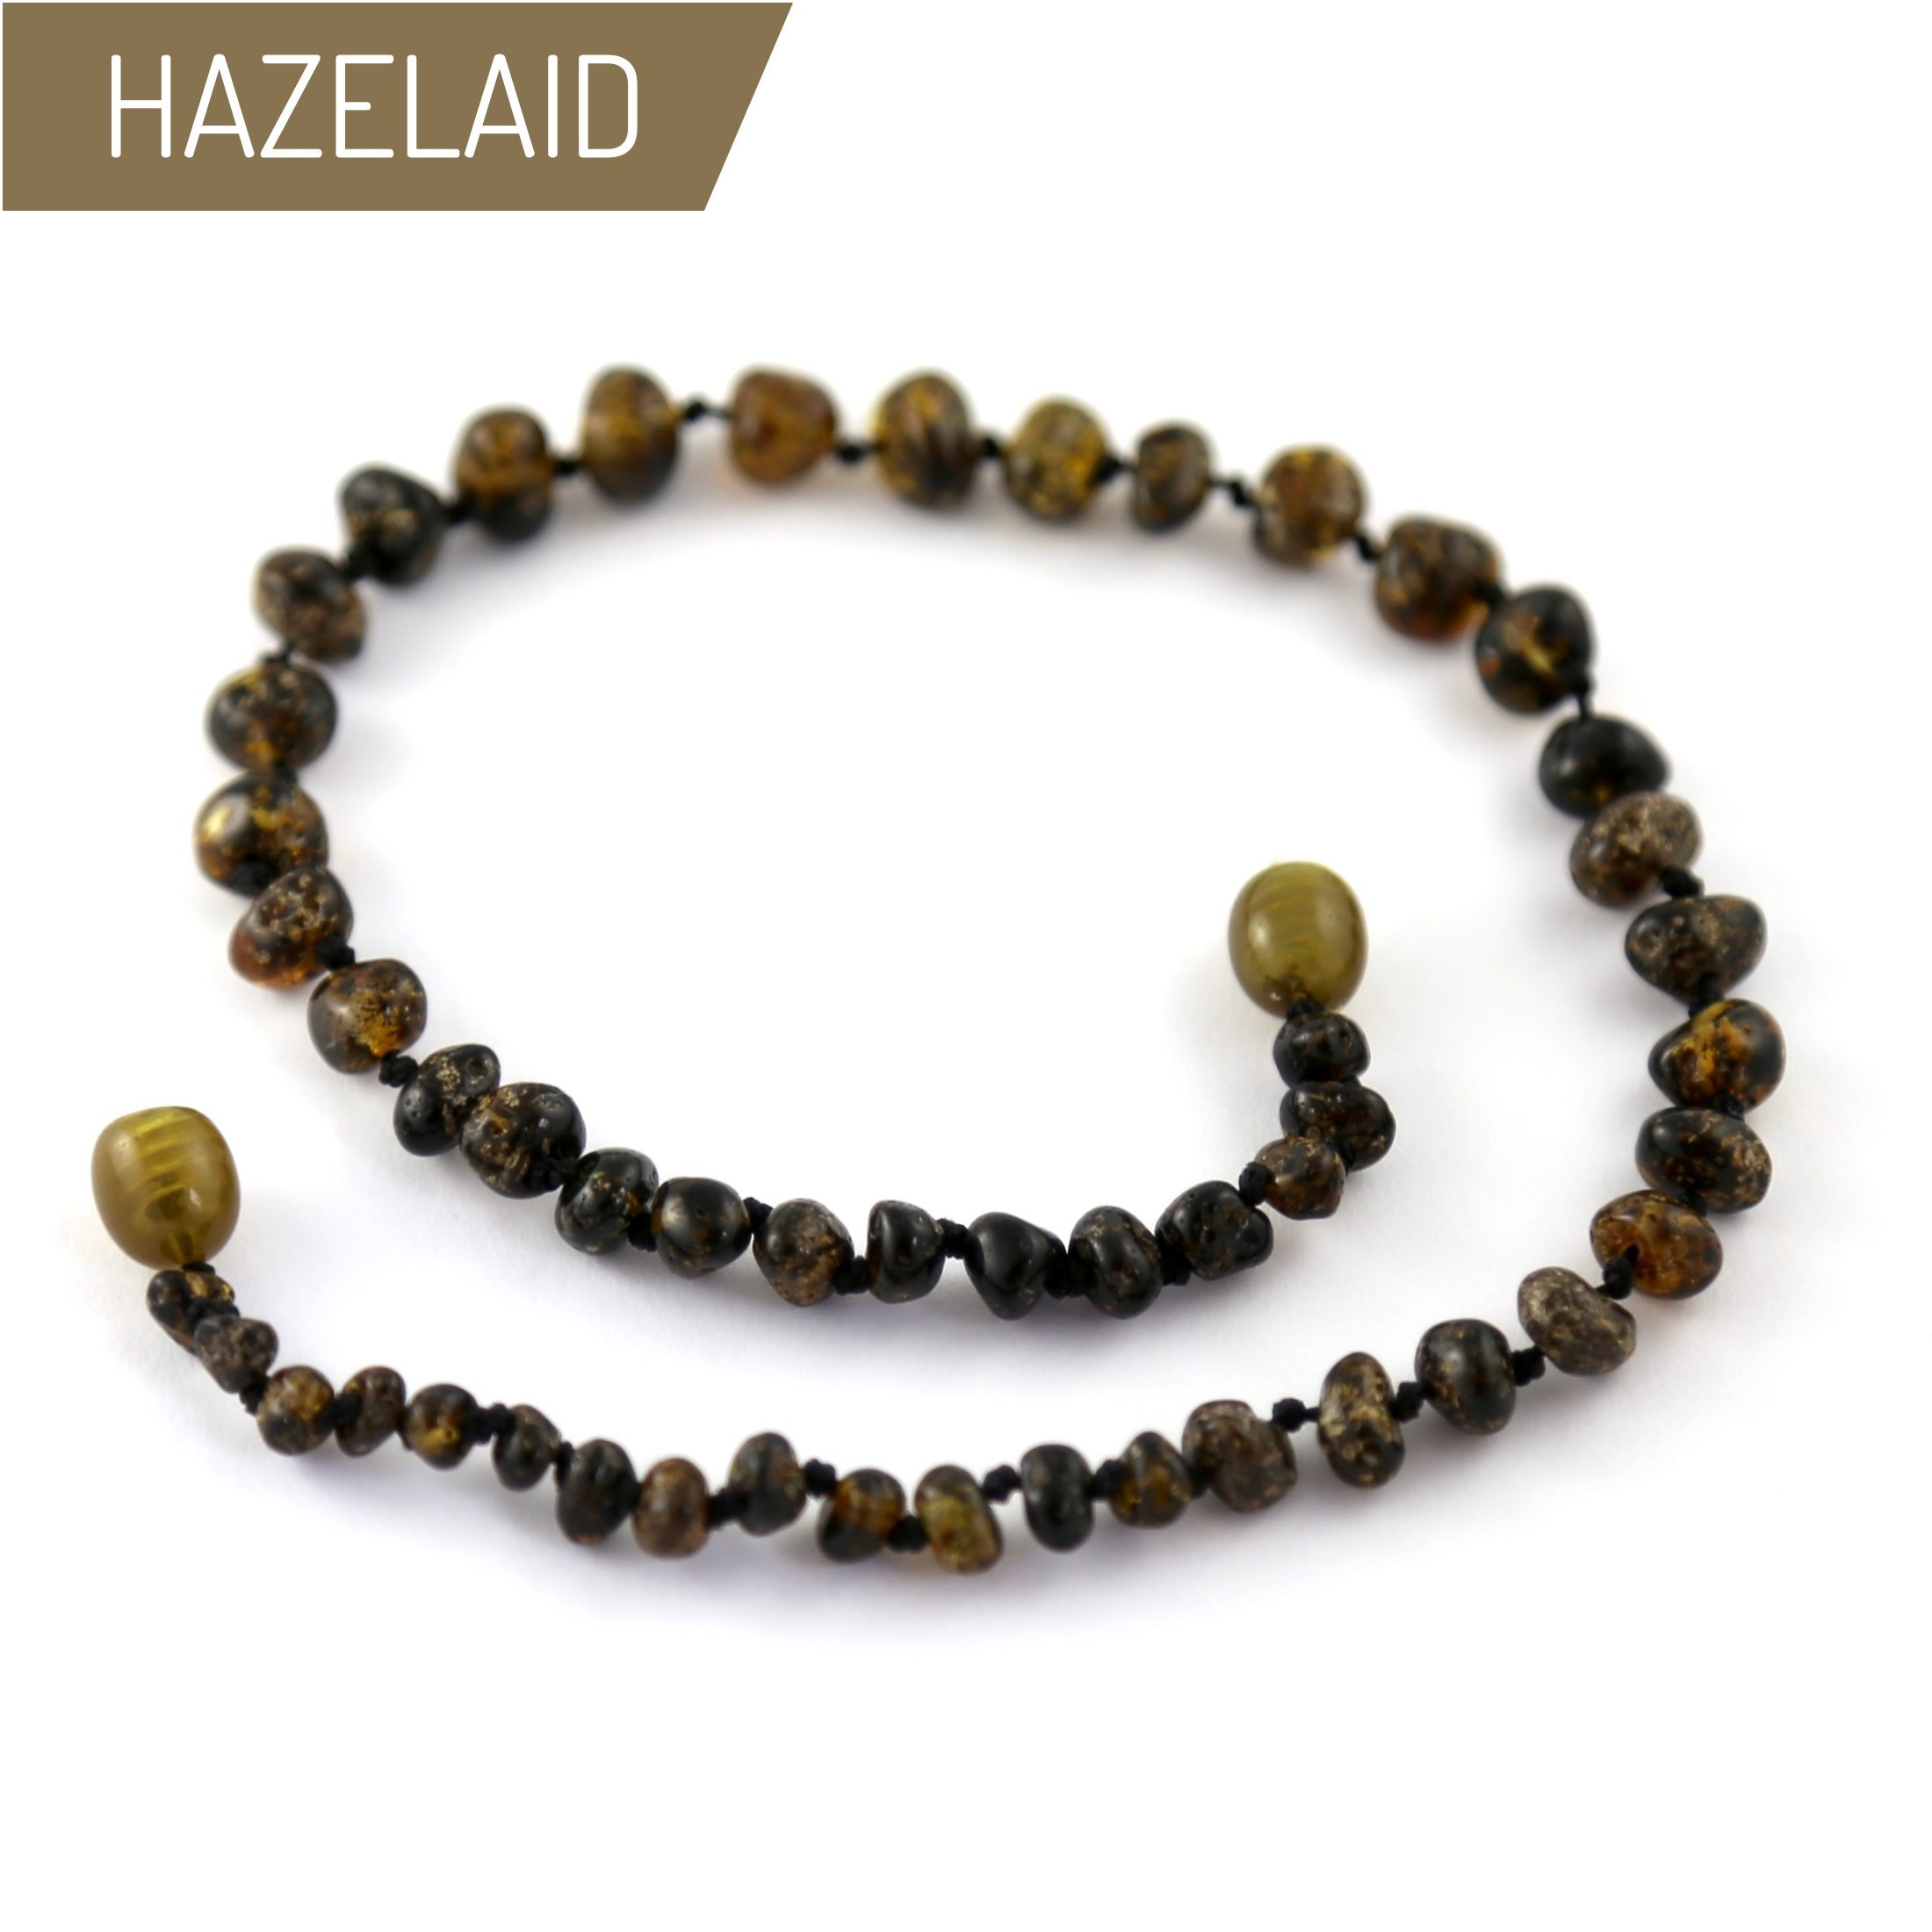 Hazelaid (TM) 12'' Baltic Amber Dark Green Necklace